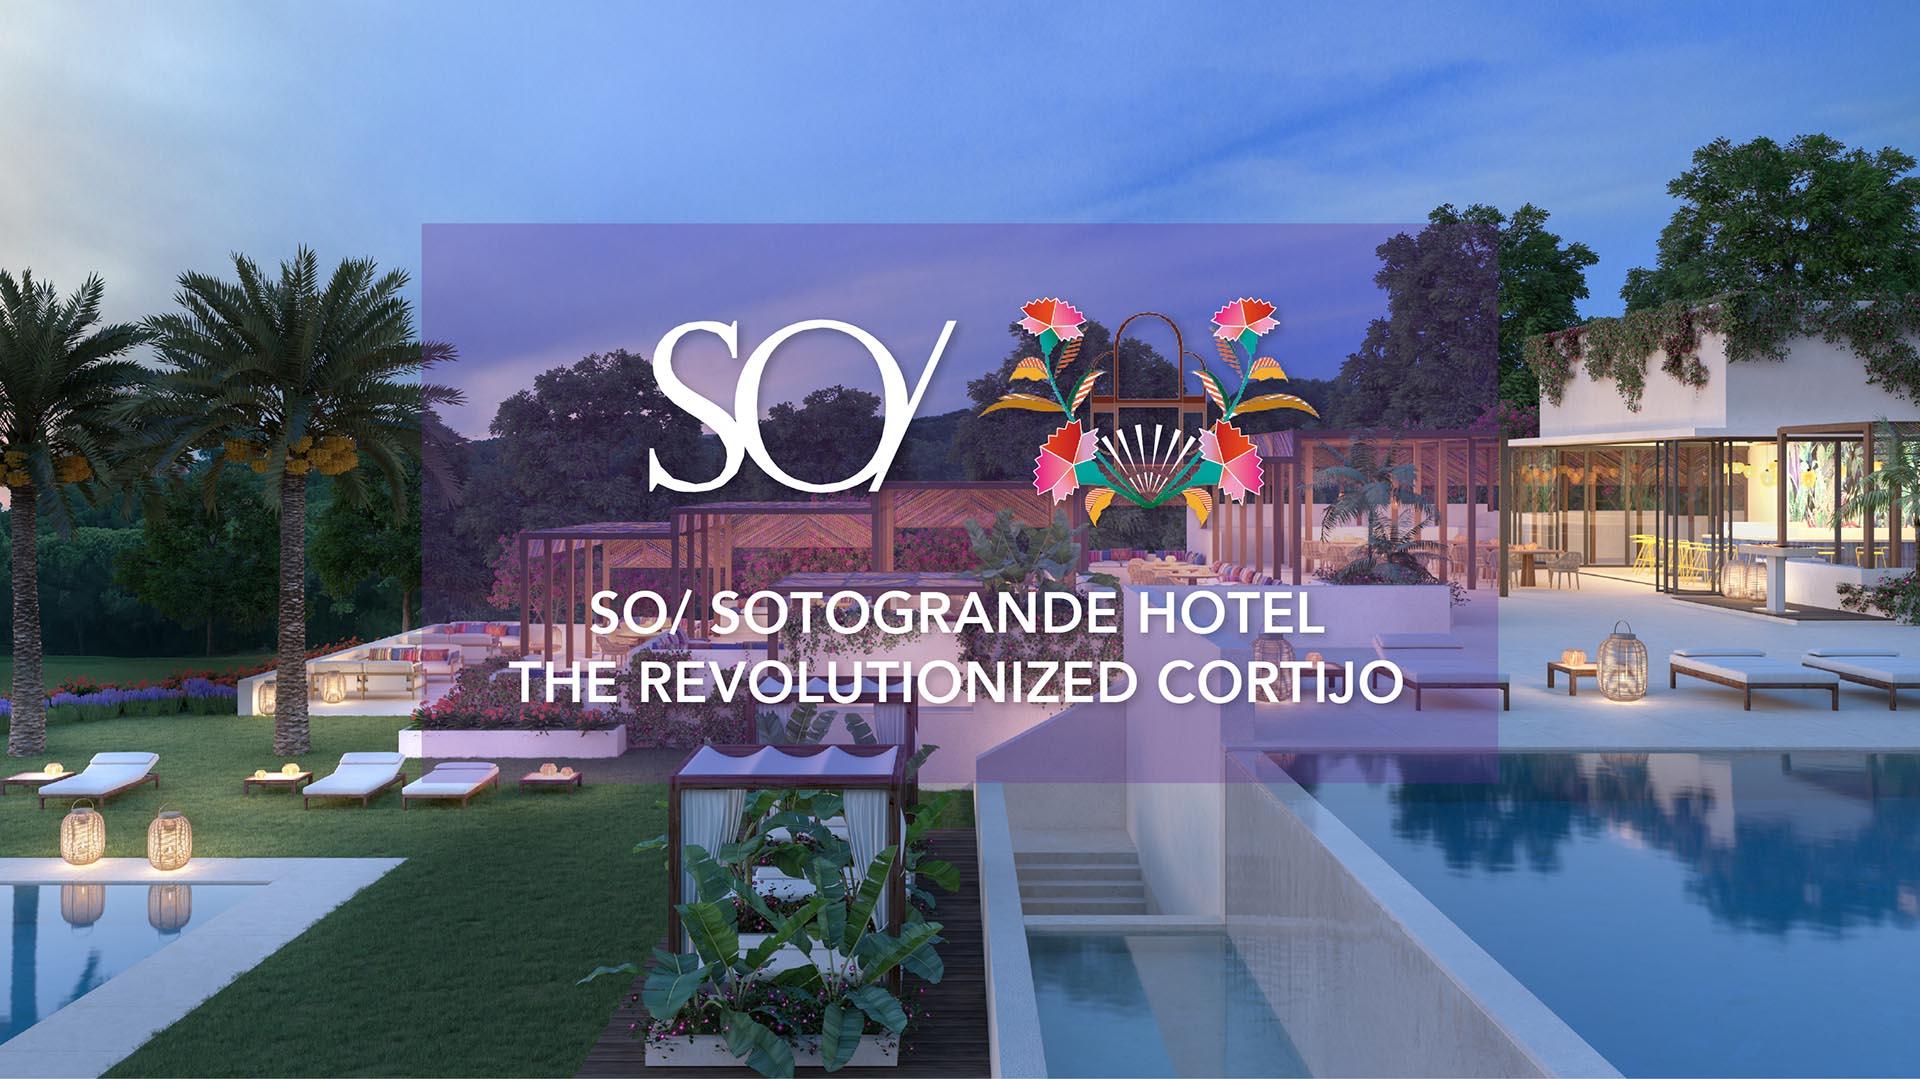 SO/ SOTOGRANDE HOTEL THE REVOLUTIONIZED CORTIJO